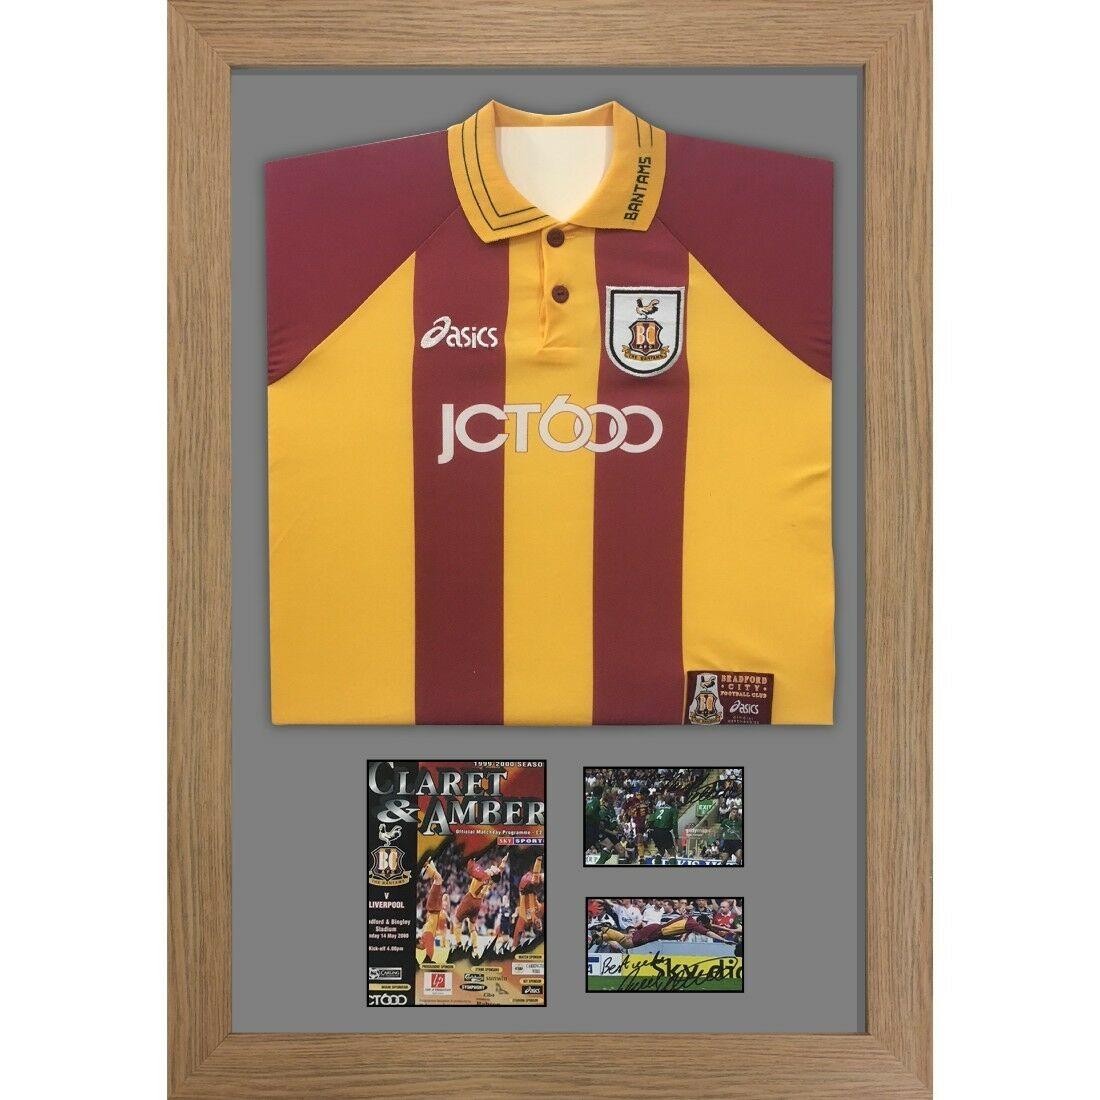 "DIY Football Shirt Frame with Football Program and 2x6"" x 4"" photos"